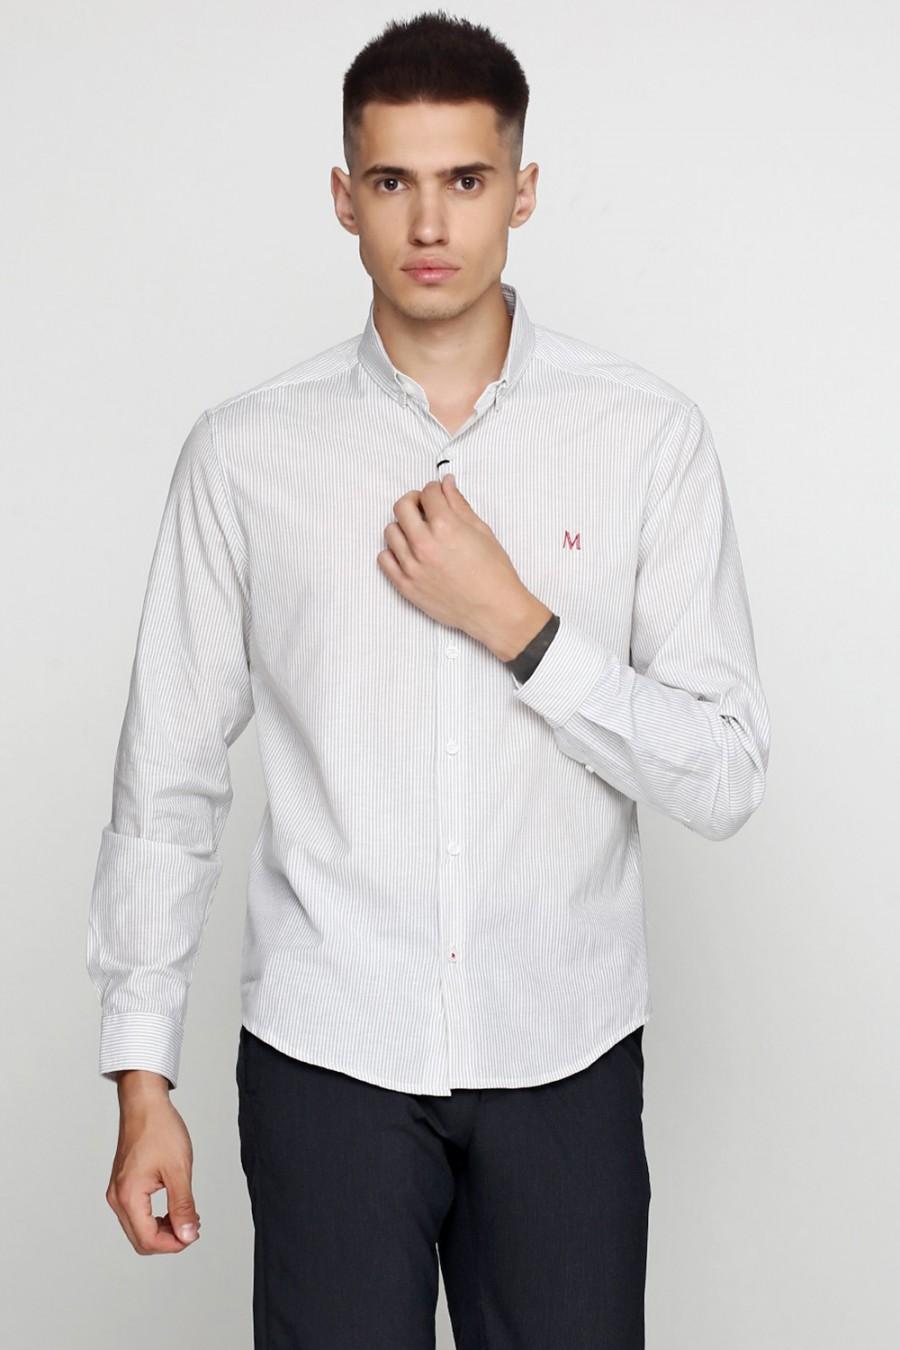 Мужская рубашка S-119-15